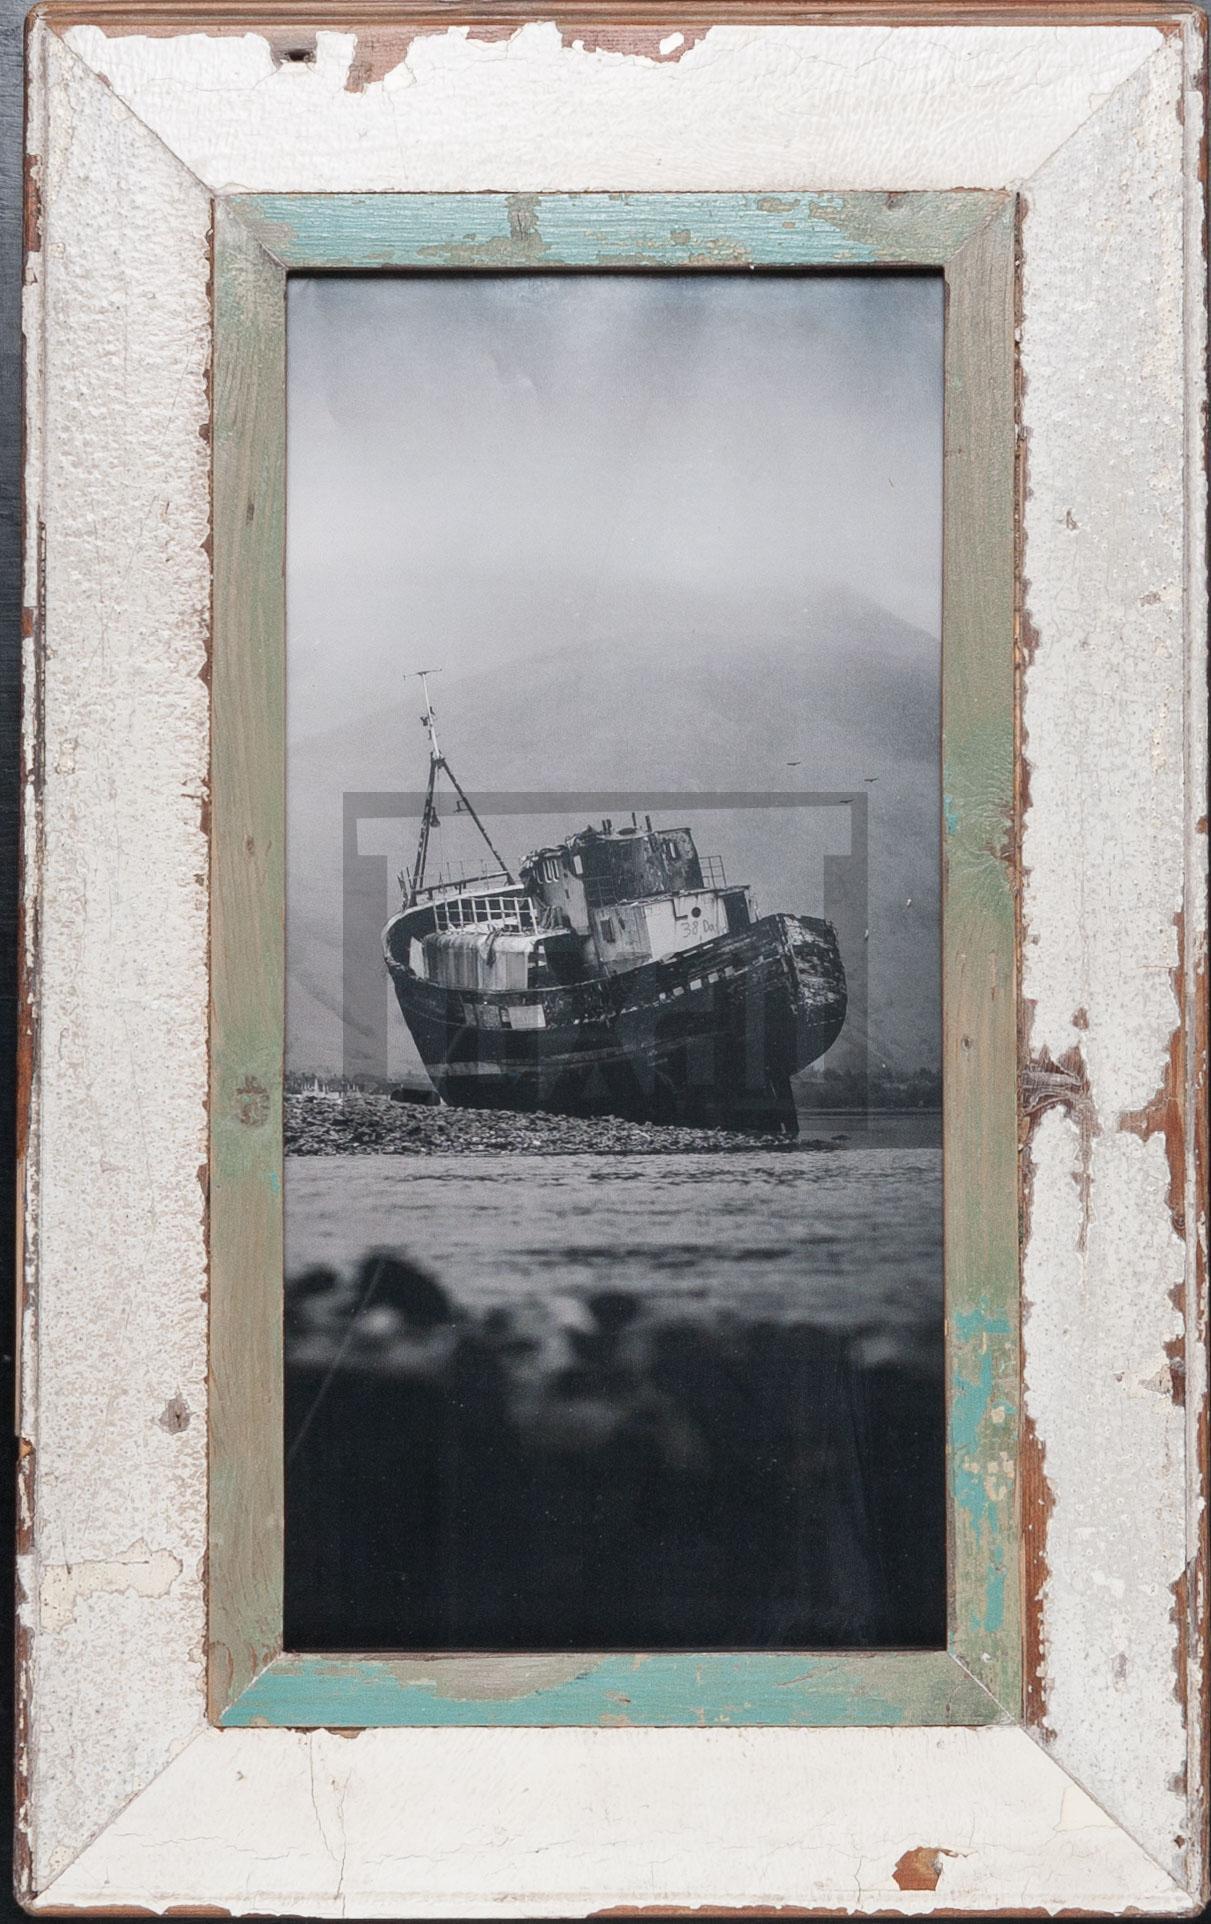 Panorama-Bilderrahmen für Panoramafotos